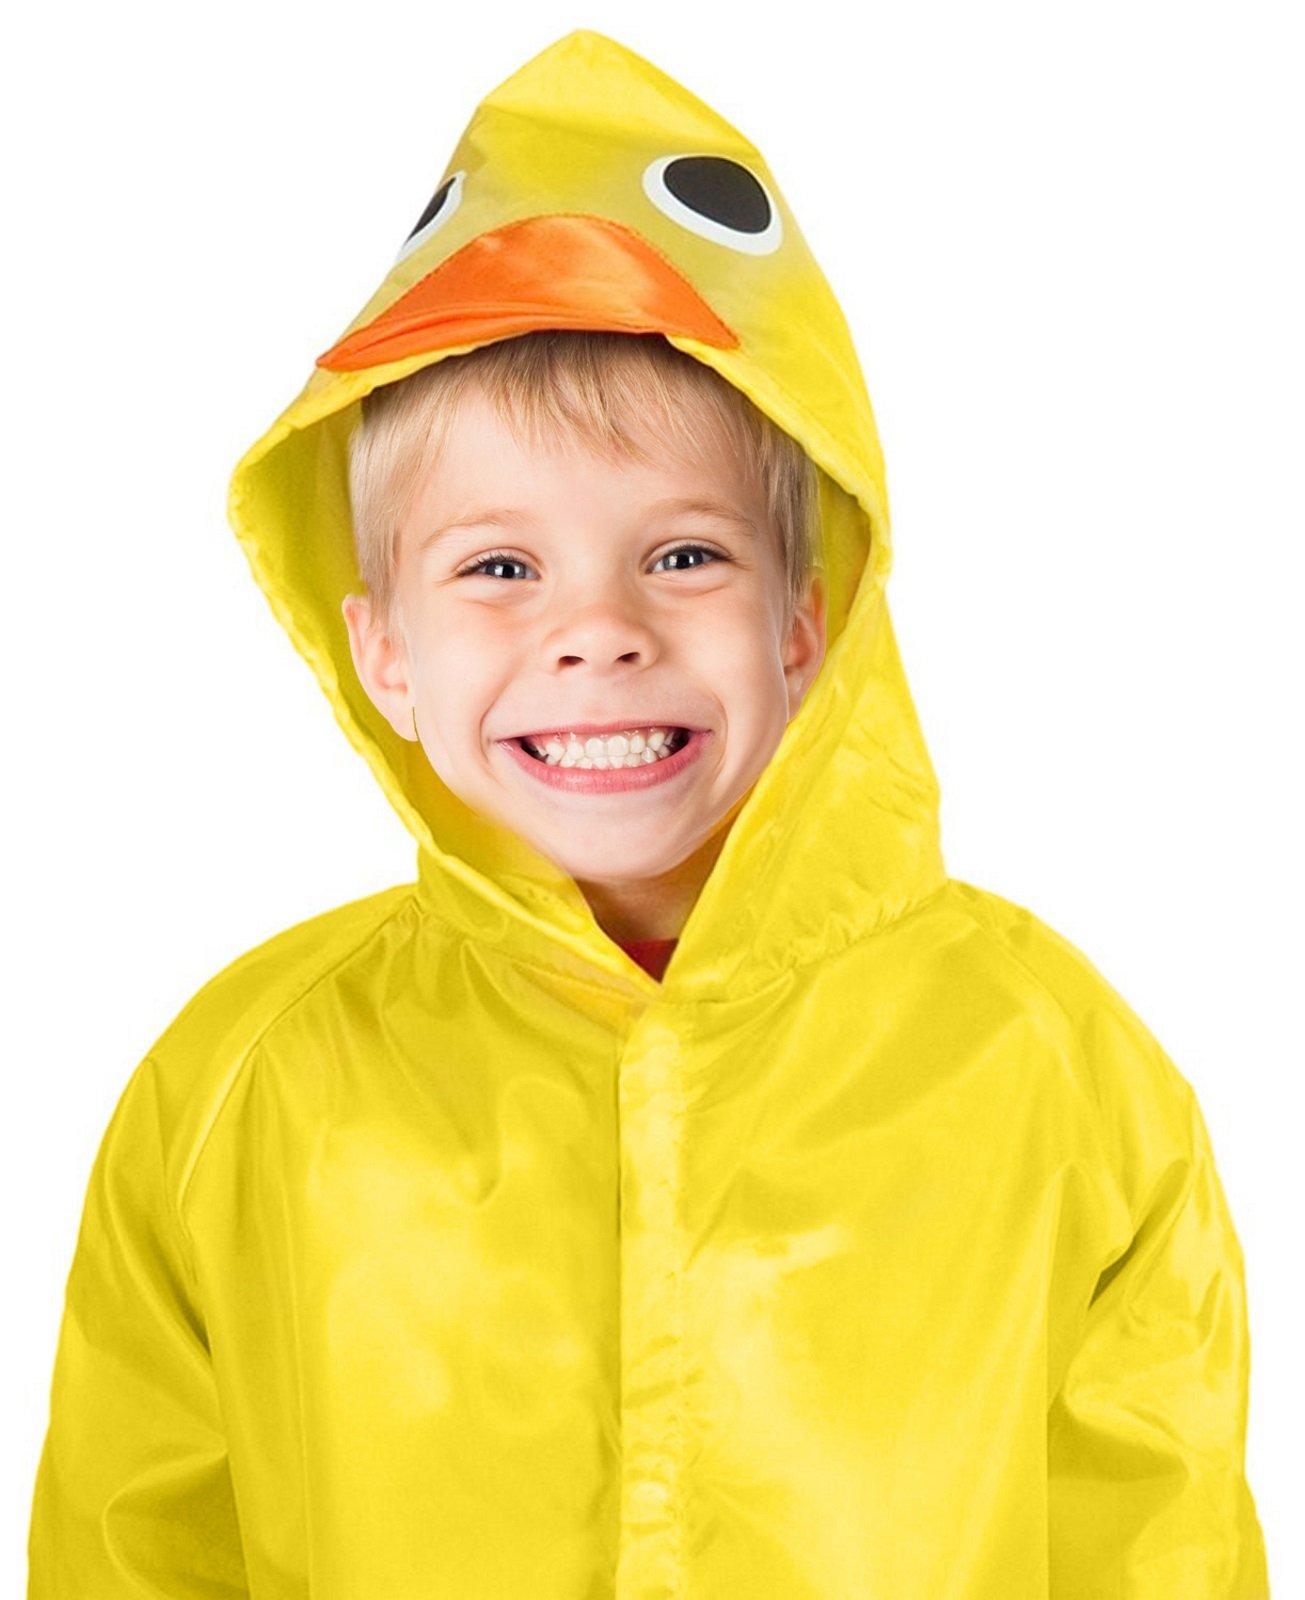 TRIBUTE Safe PVC Free Kids Rain Coat Boys or Girls Ages 7-12 Rain Poncho For Children With Zipper Fun Raincoat, Yellow Duck